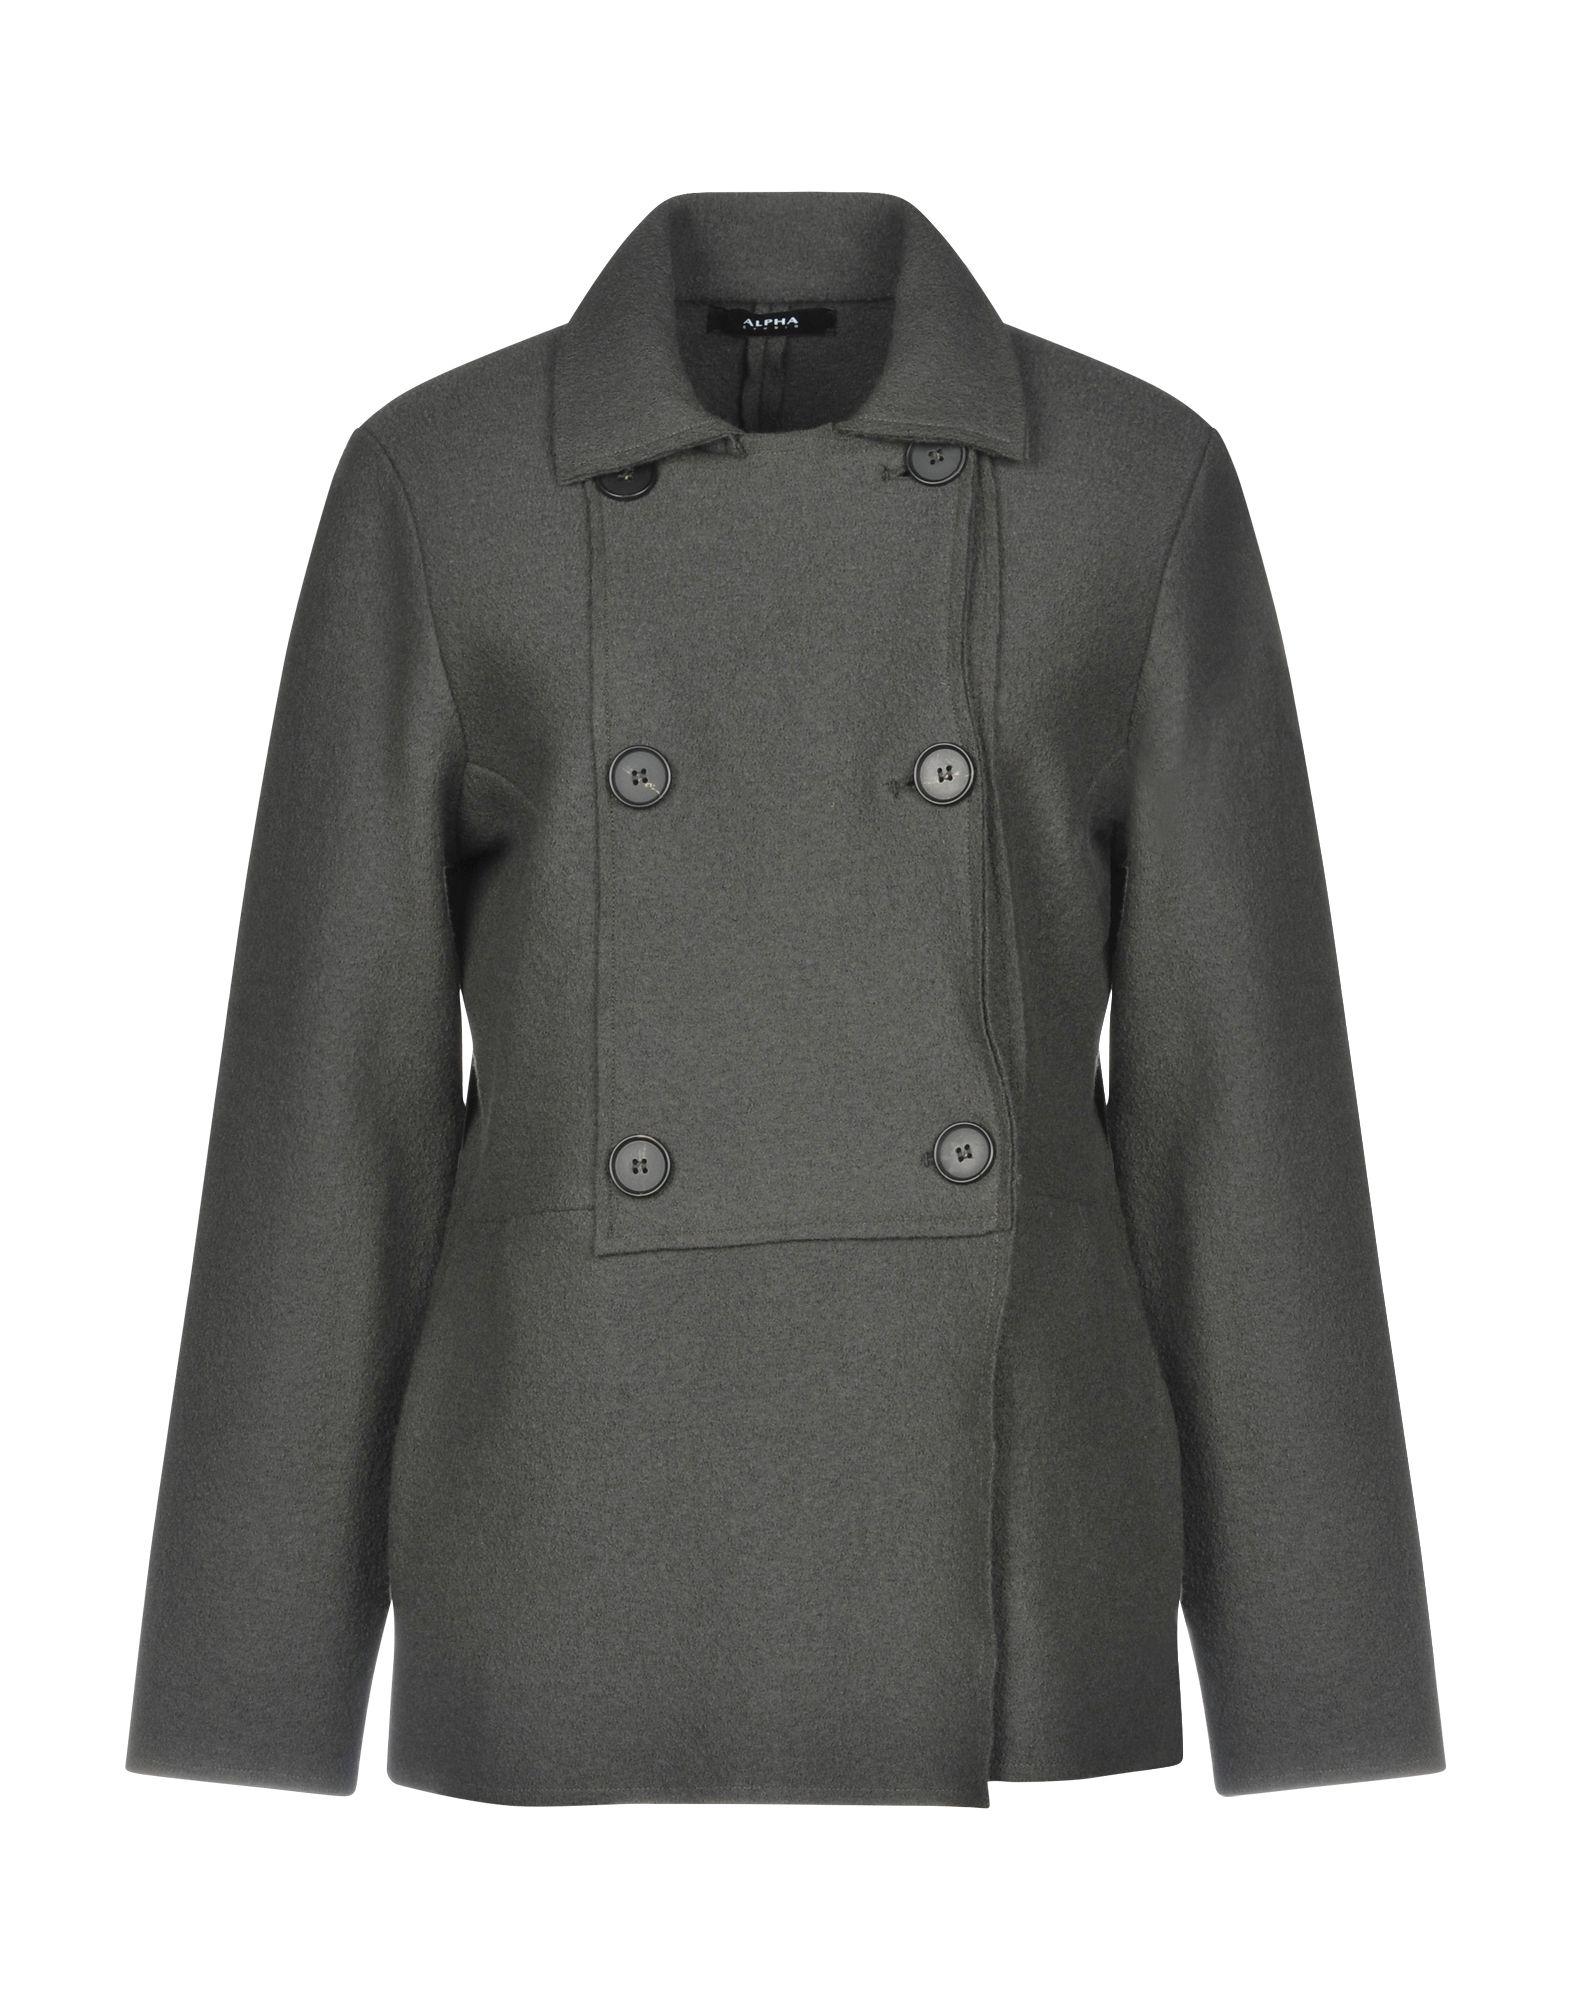 ALPHA STUDIO Пальто пальто алонзо d'imma fashion studio